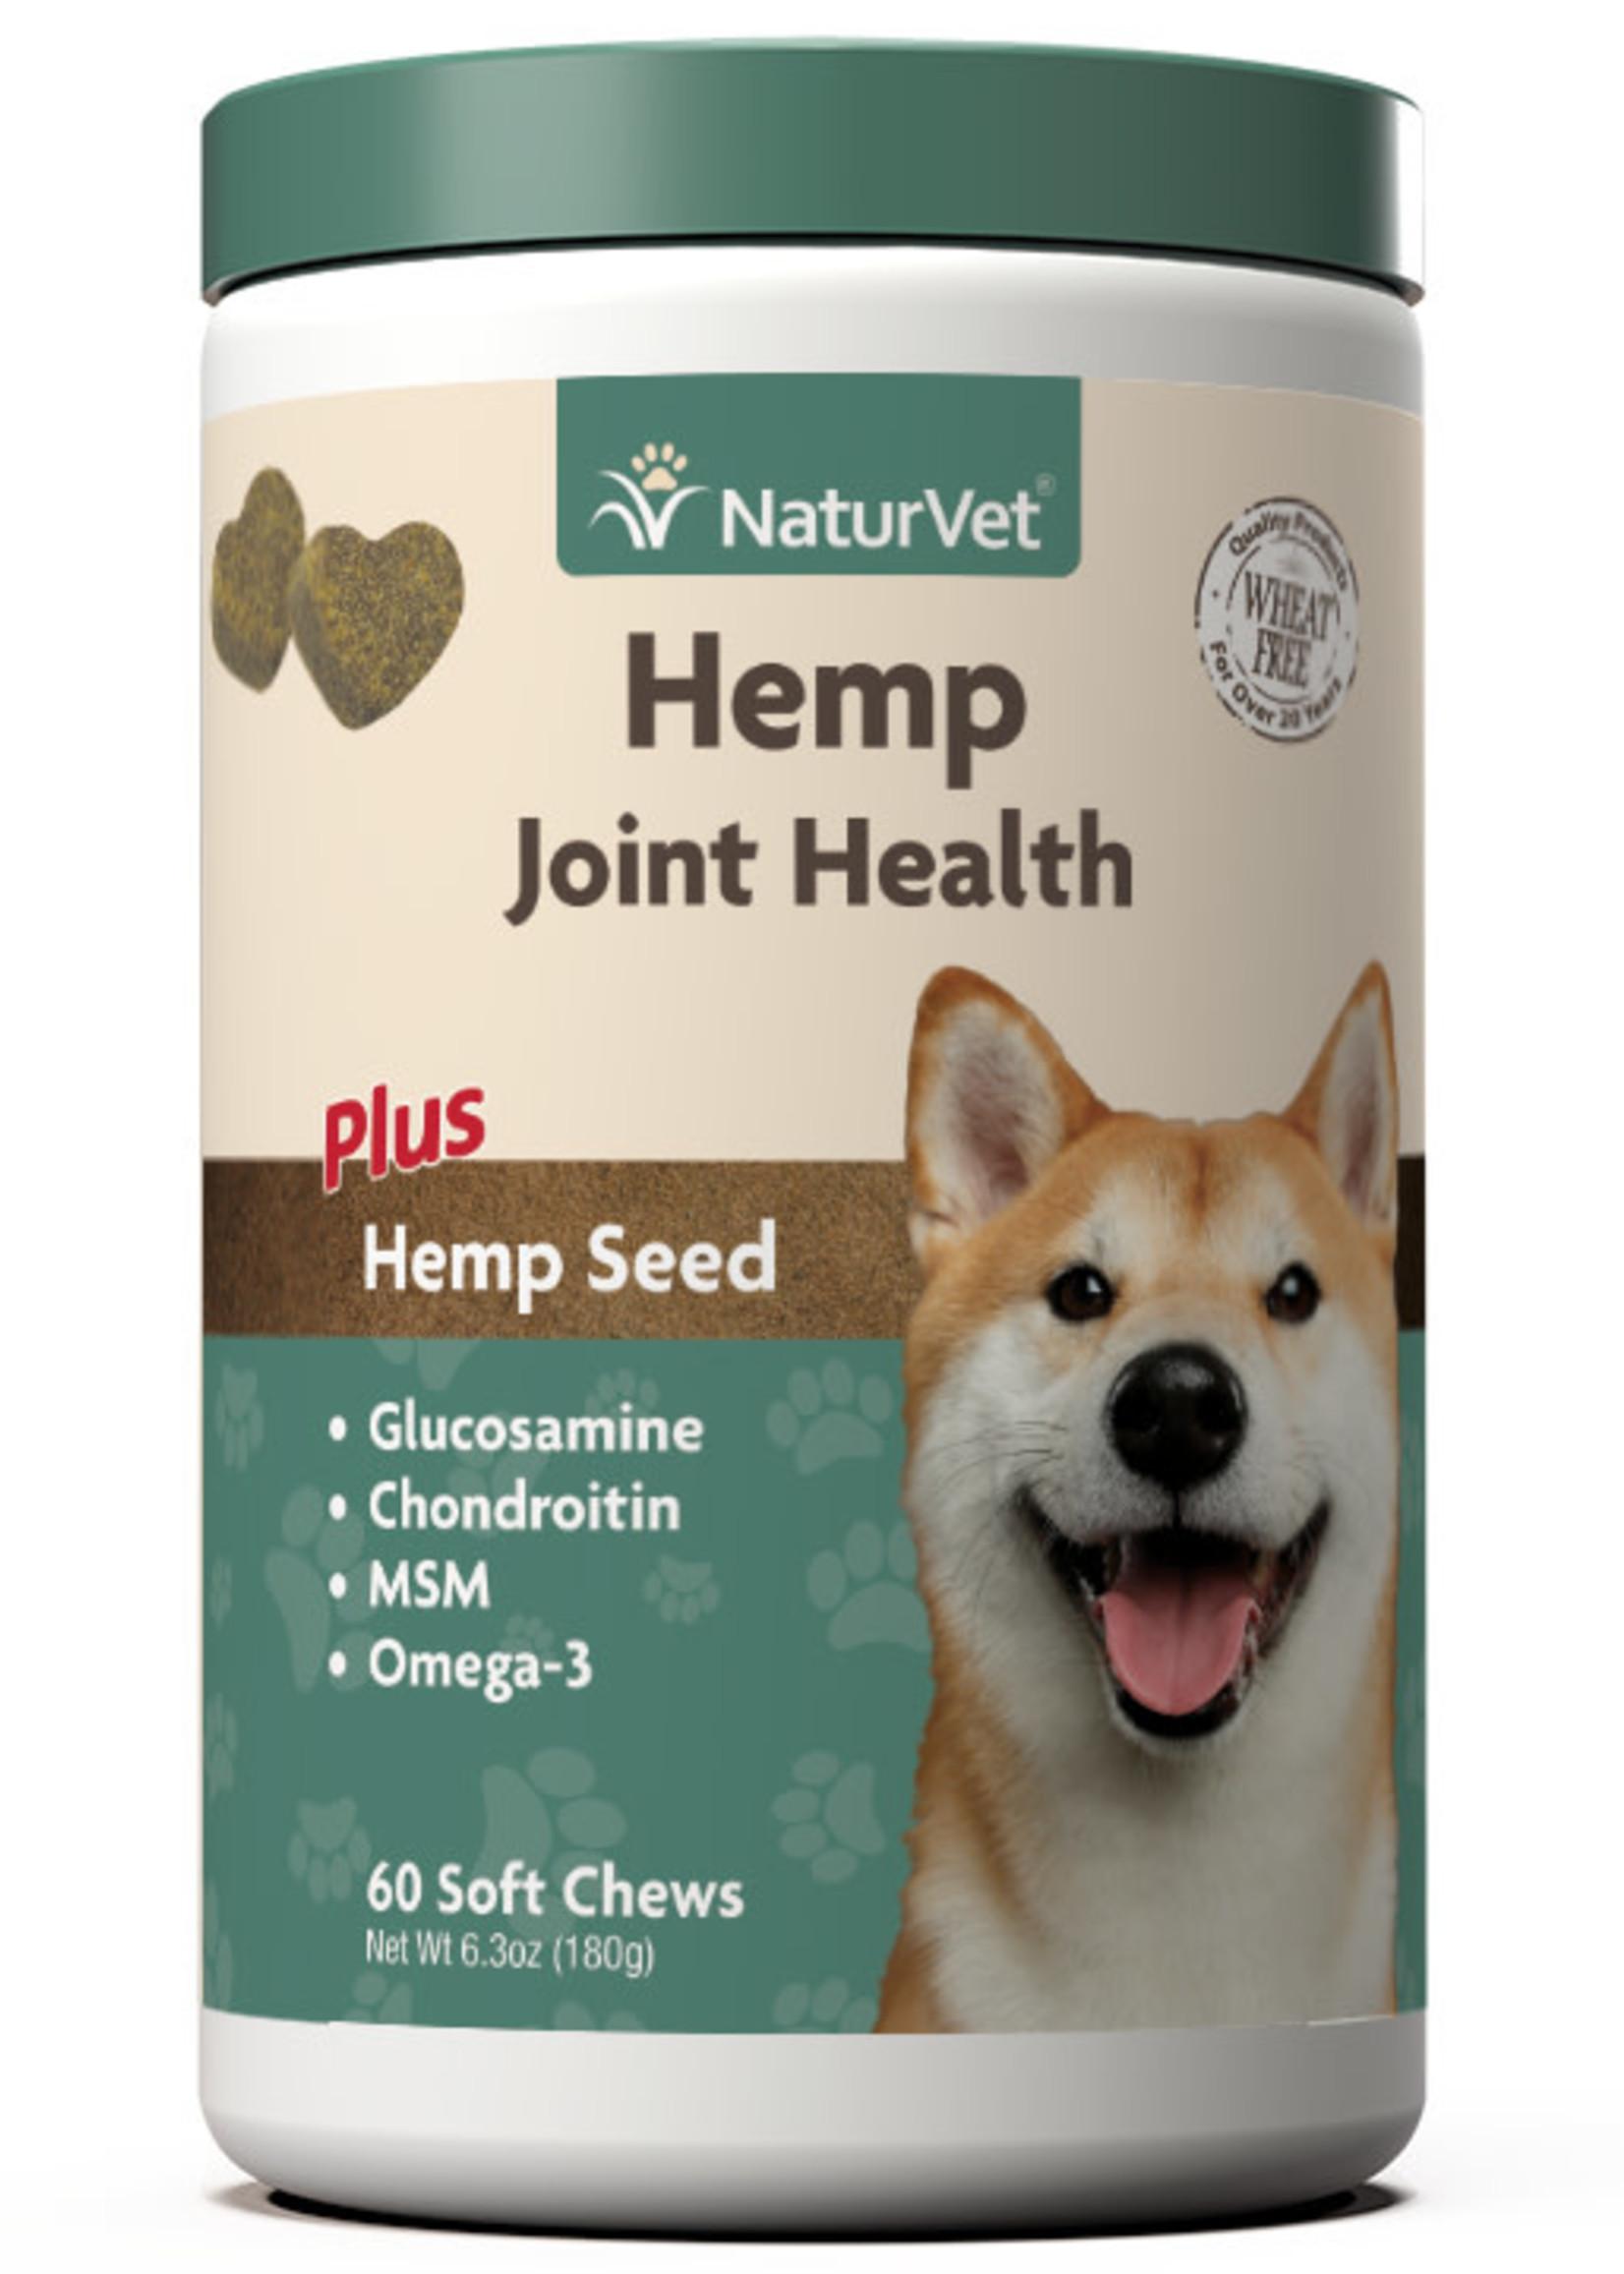 NaturVet NaturVet Dog Hemp Joint Health Soft Chew